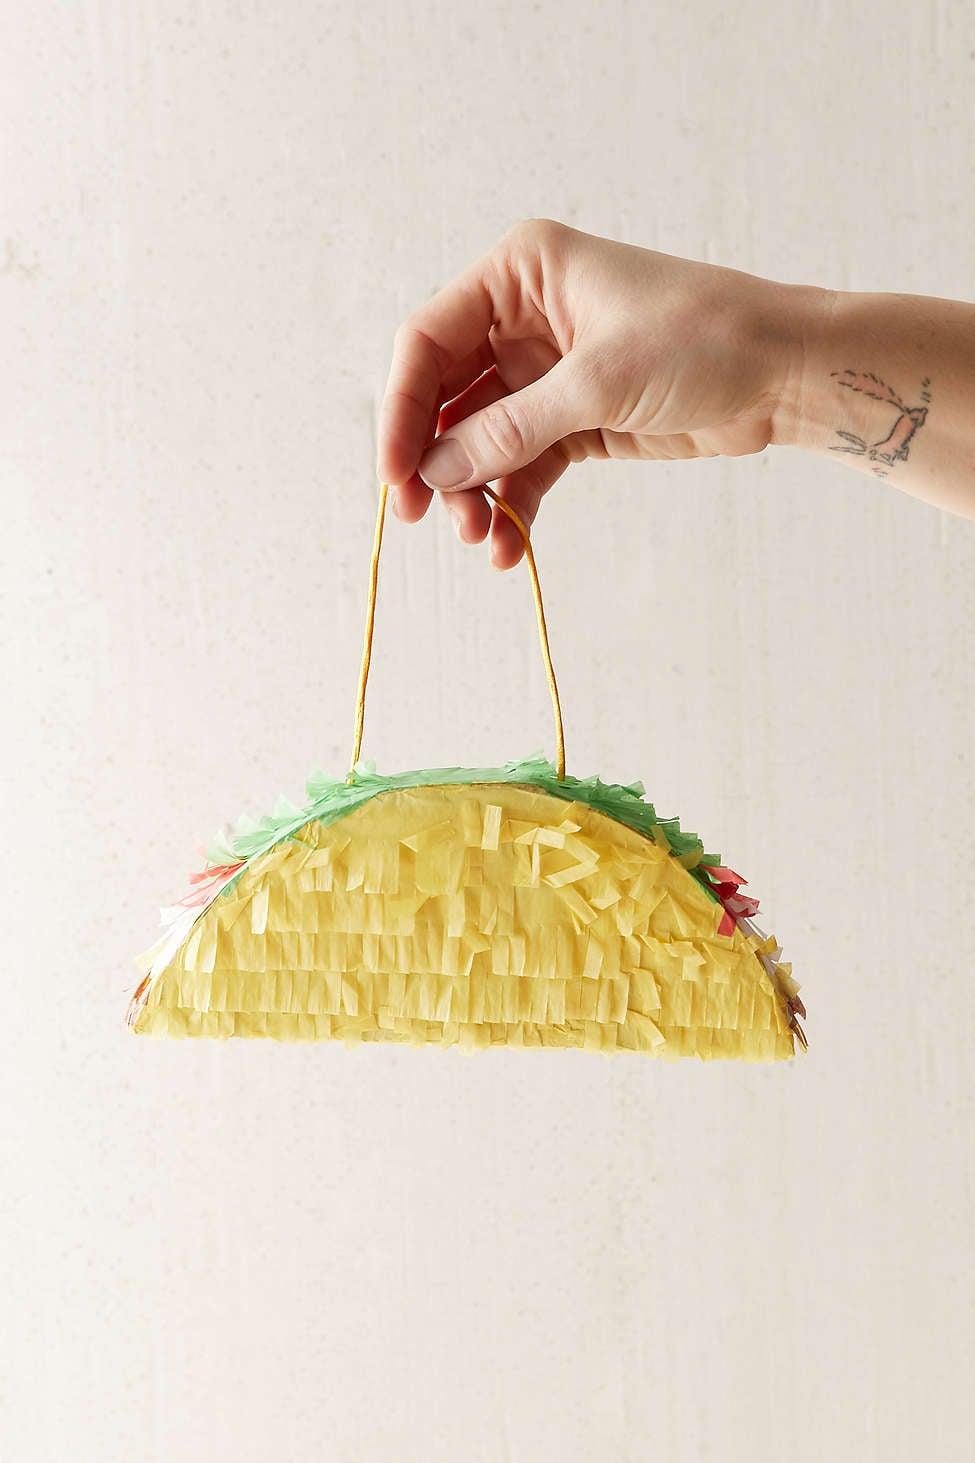 Mini Taco Pinata 10 15 Pinatas So Cute You Ll Want Them For Your Own Birthday Popsugar Latina Photo 13